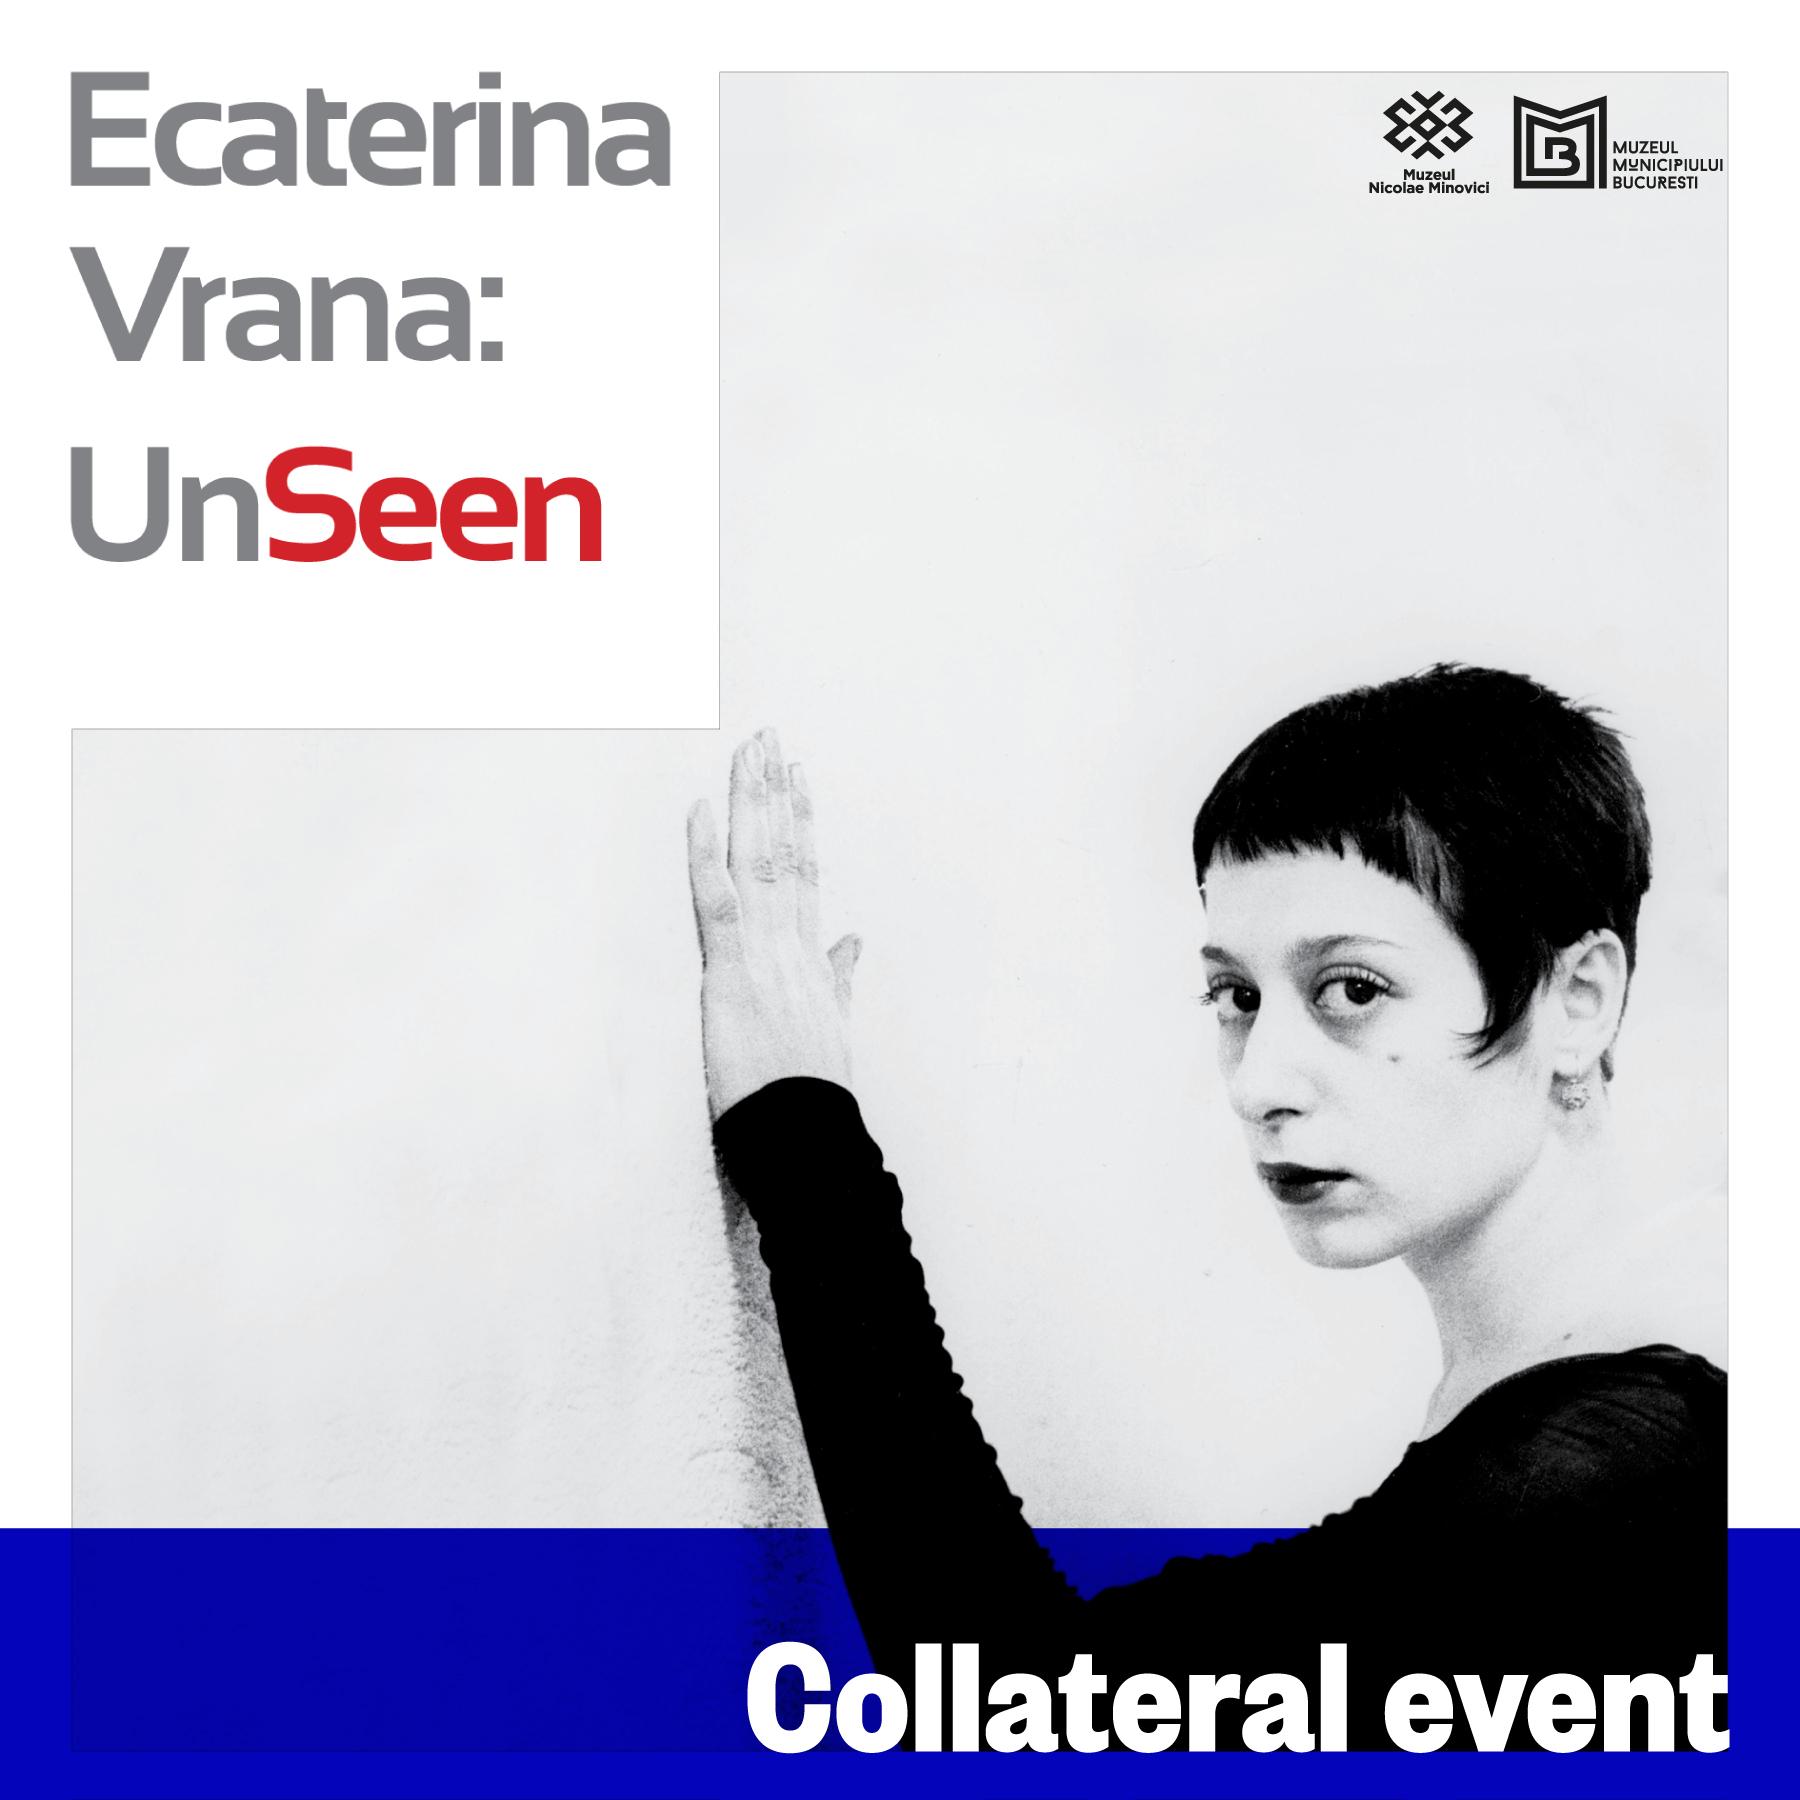 Eveniment-Colateral_en